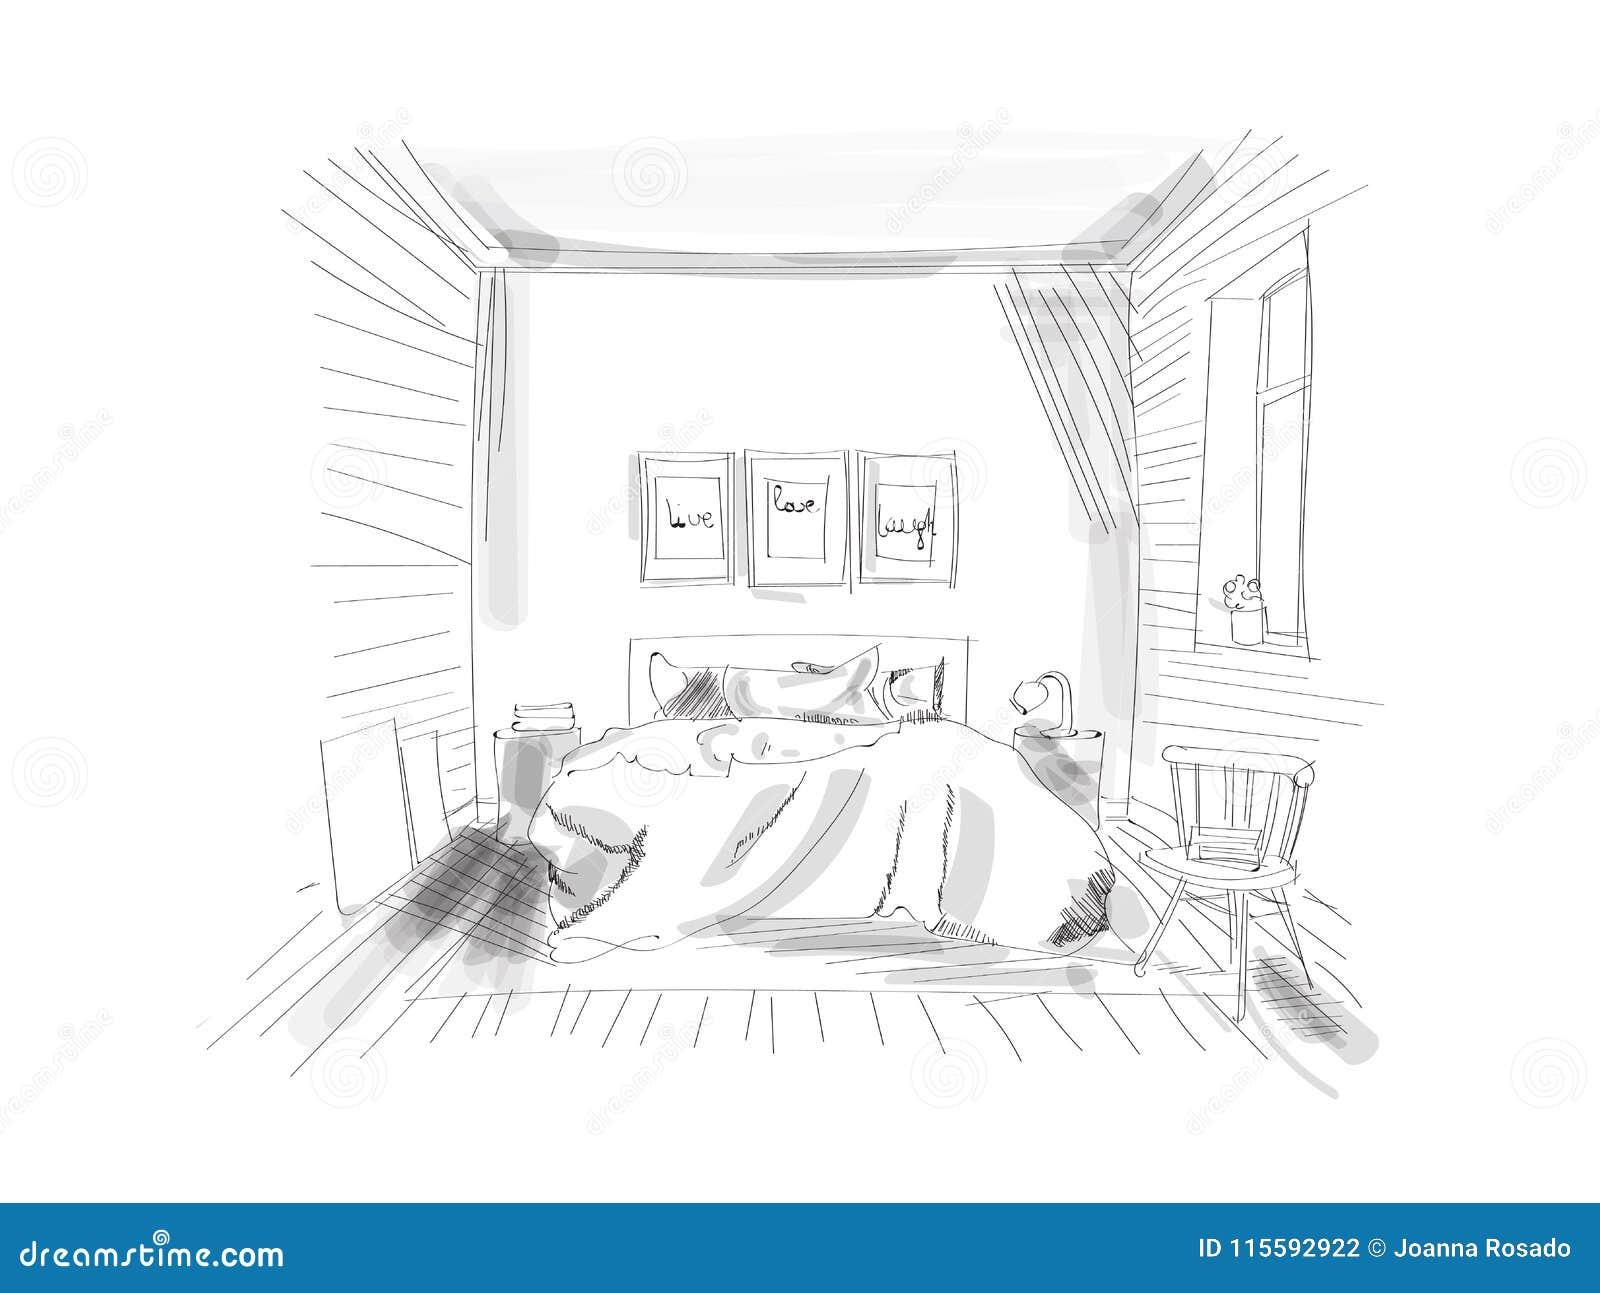 Interior design sketch hand drawn vector illustration of bedroom furniture